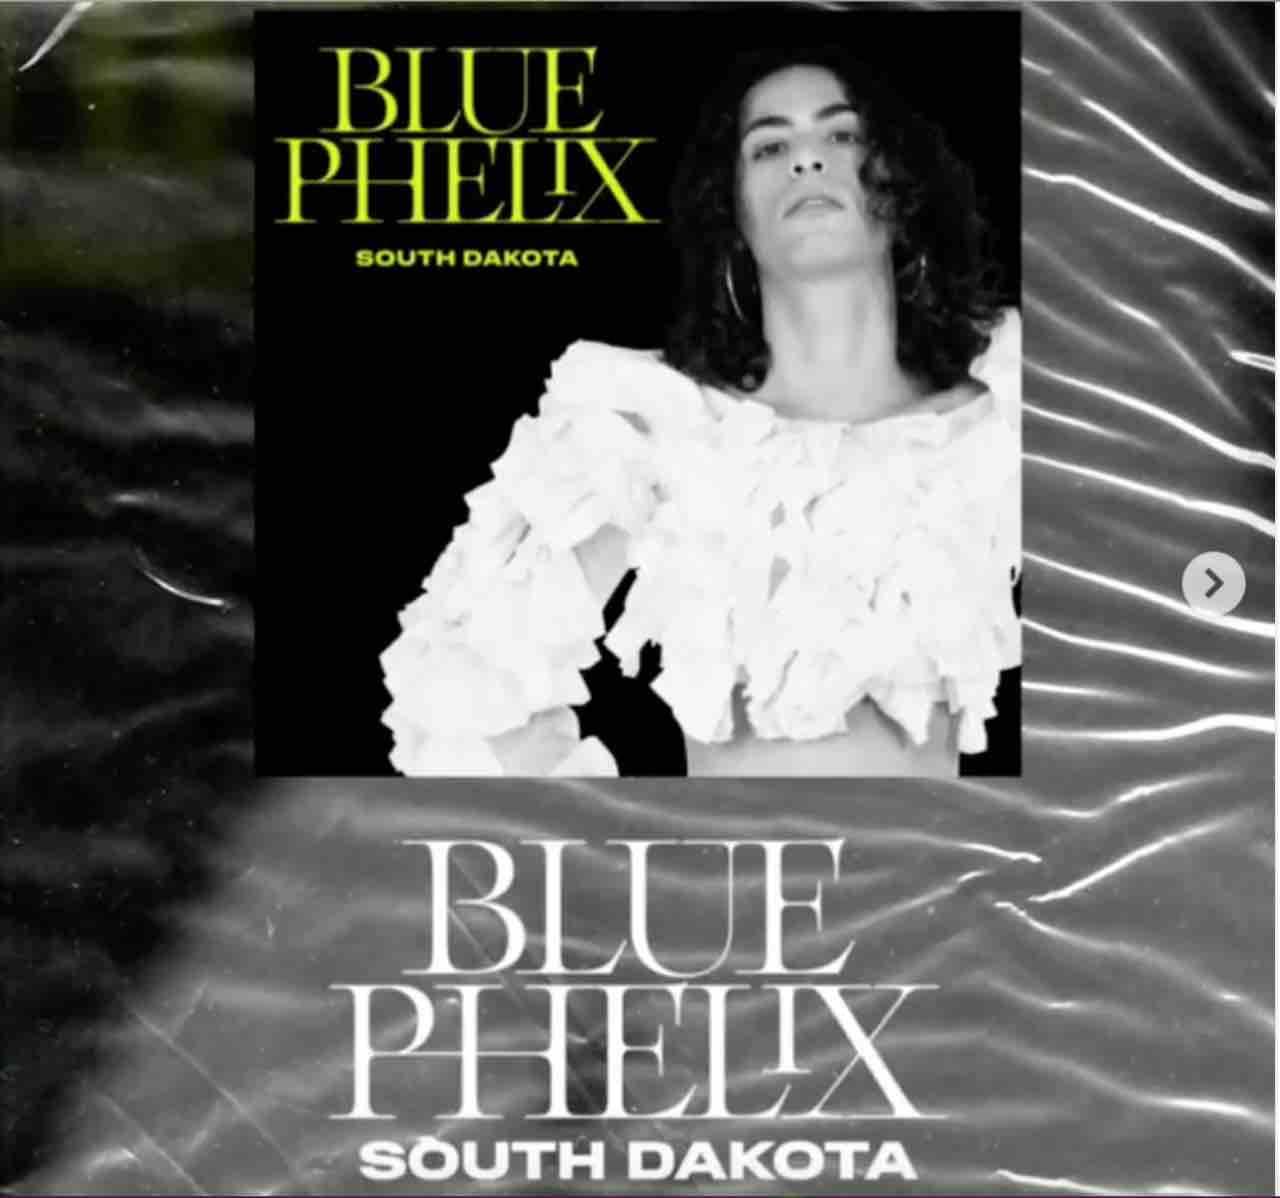 Blue Phelix South Dakota